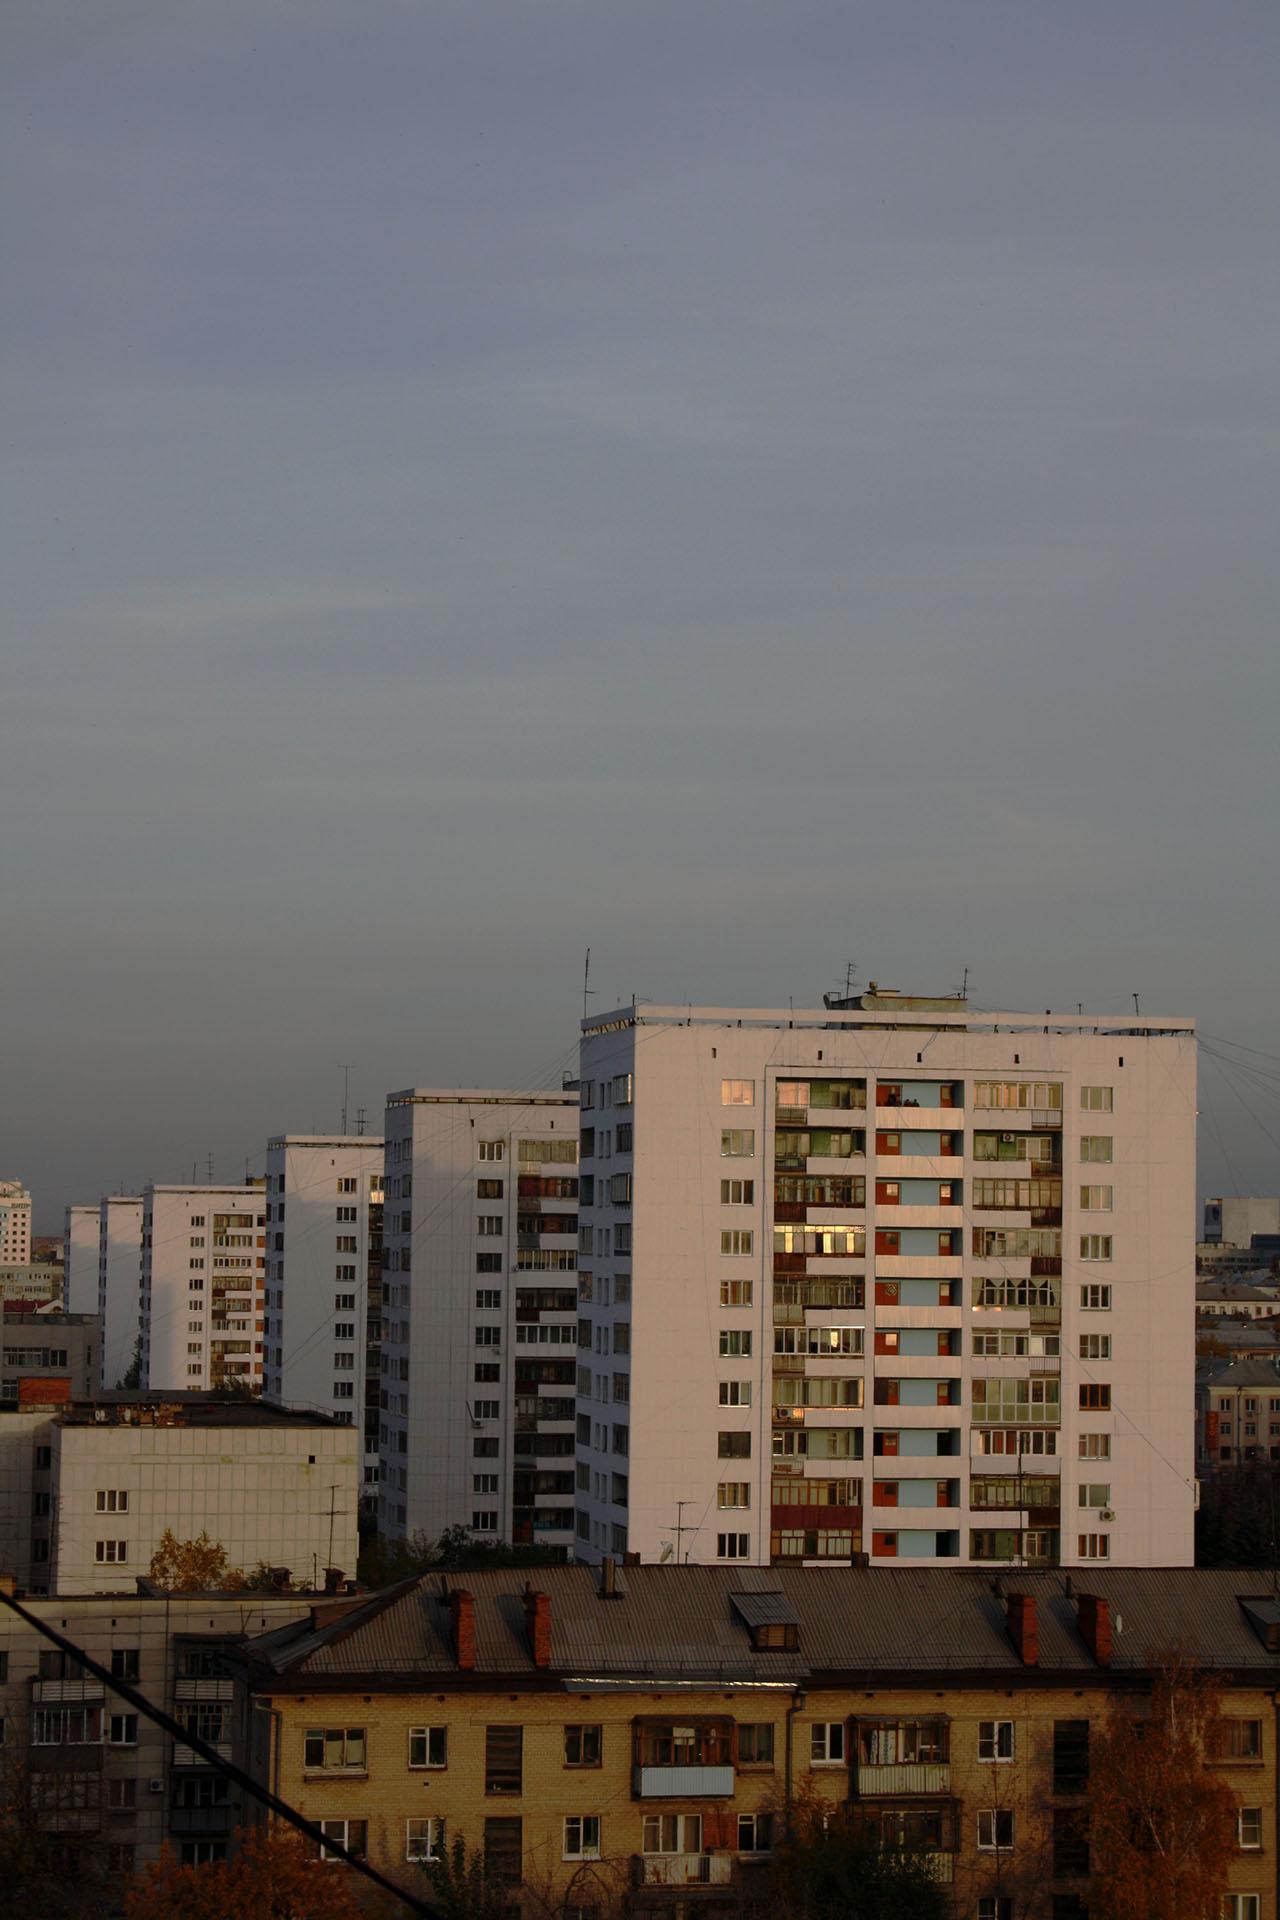 Дома Челябинска (27.11.2013)